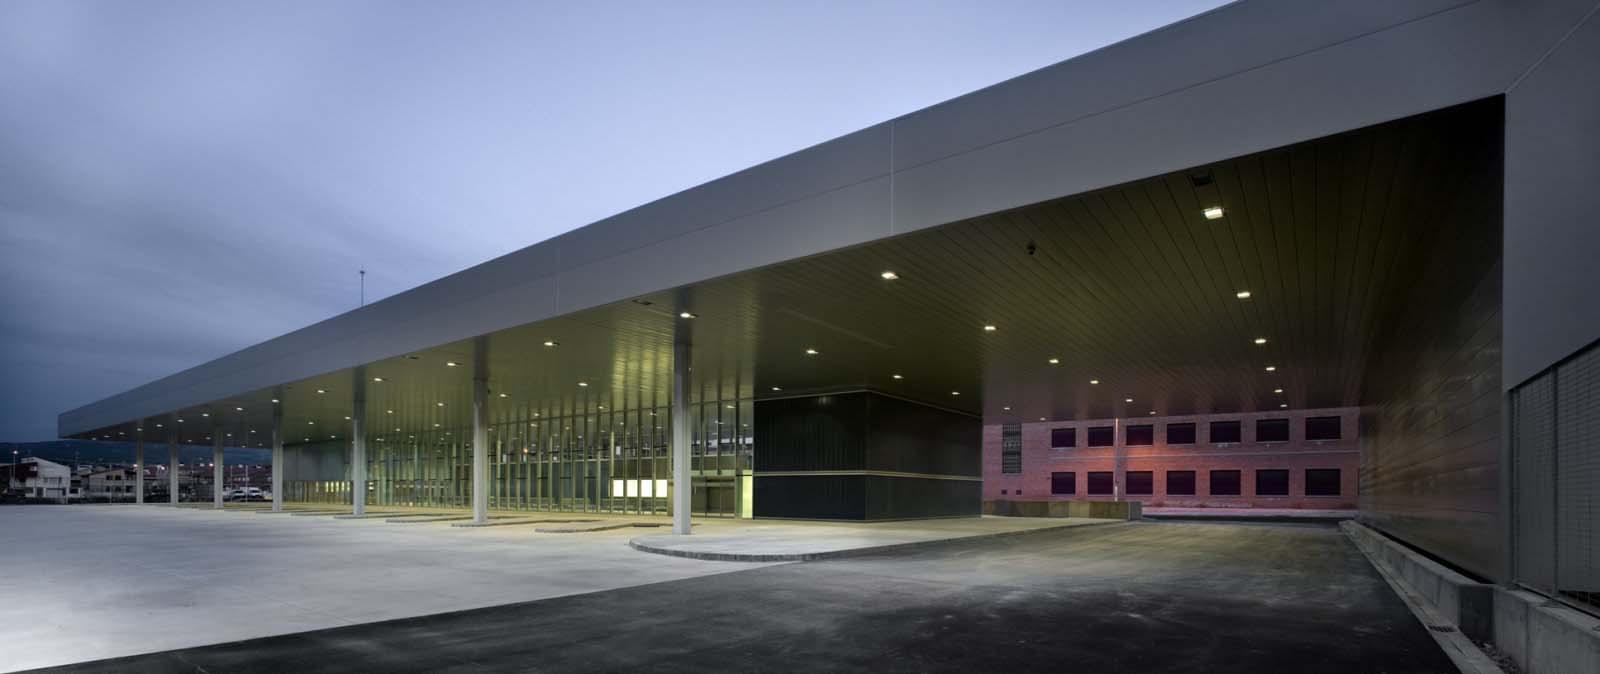 Calatayud_Bus_Station_05_Architecture_IDOM_photo_Aitor_Ortiz